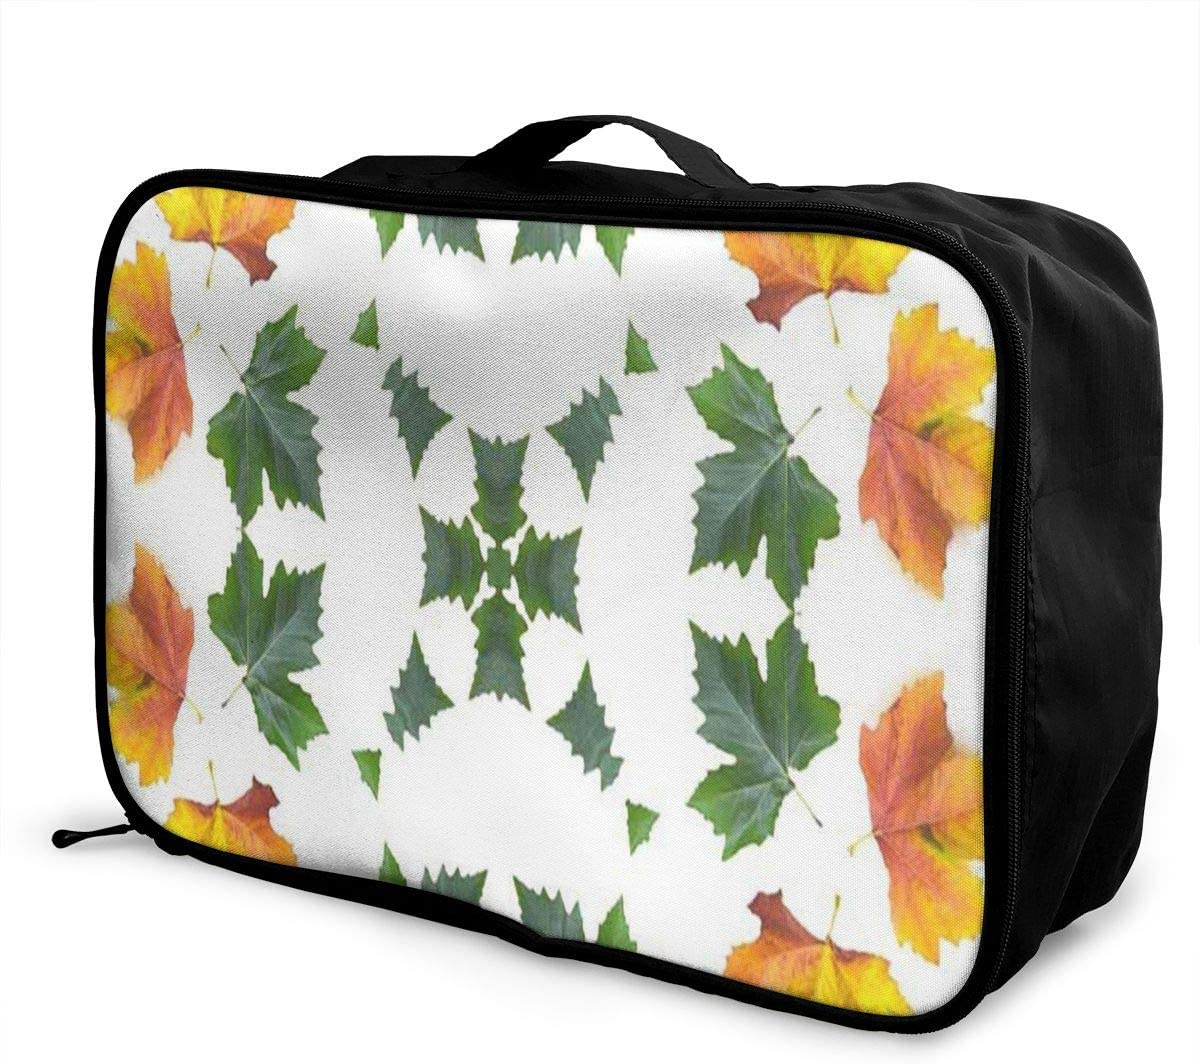 Travel Bags Autumn Orange Maple Leaf Mandala Portable Tote Trolley Handle Luggage Bag